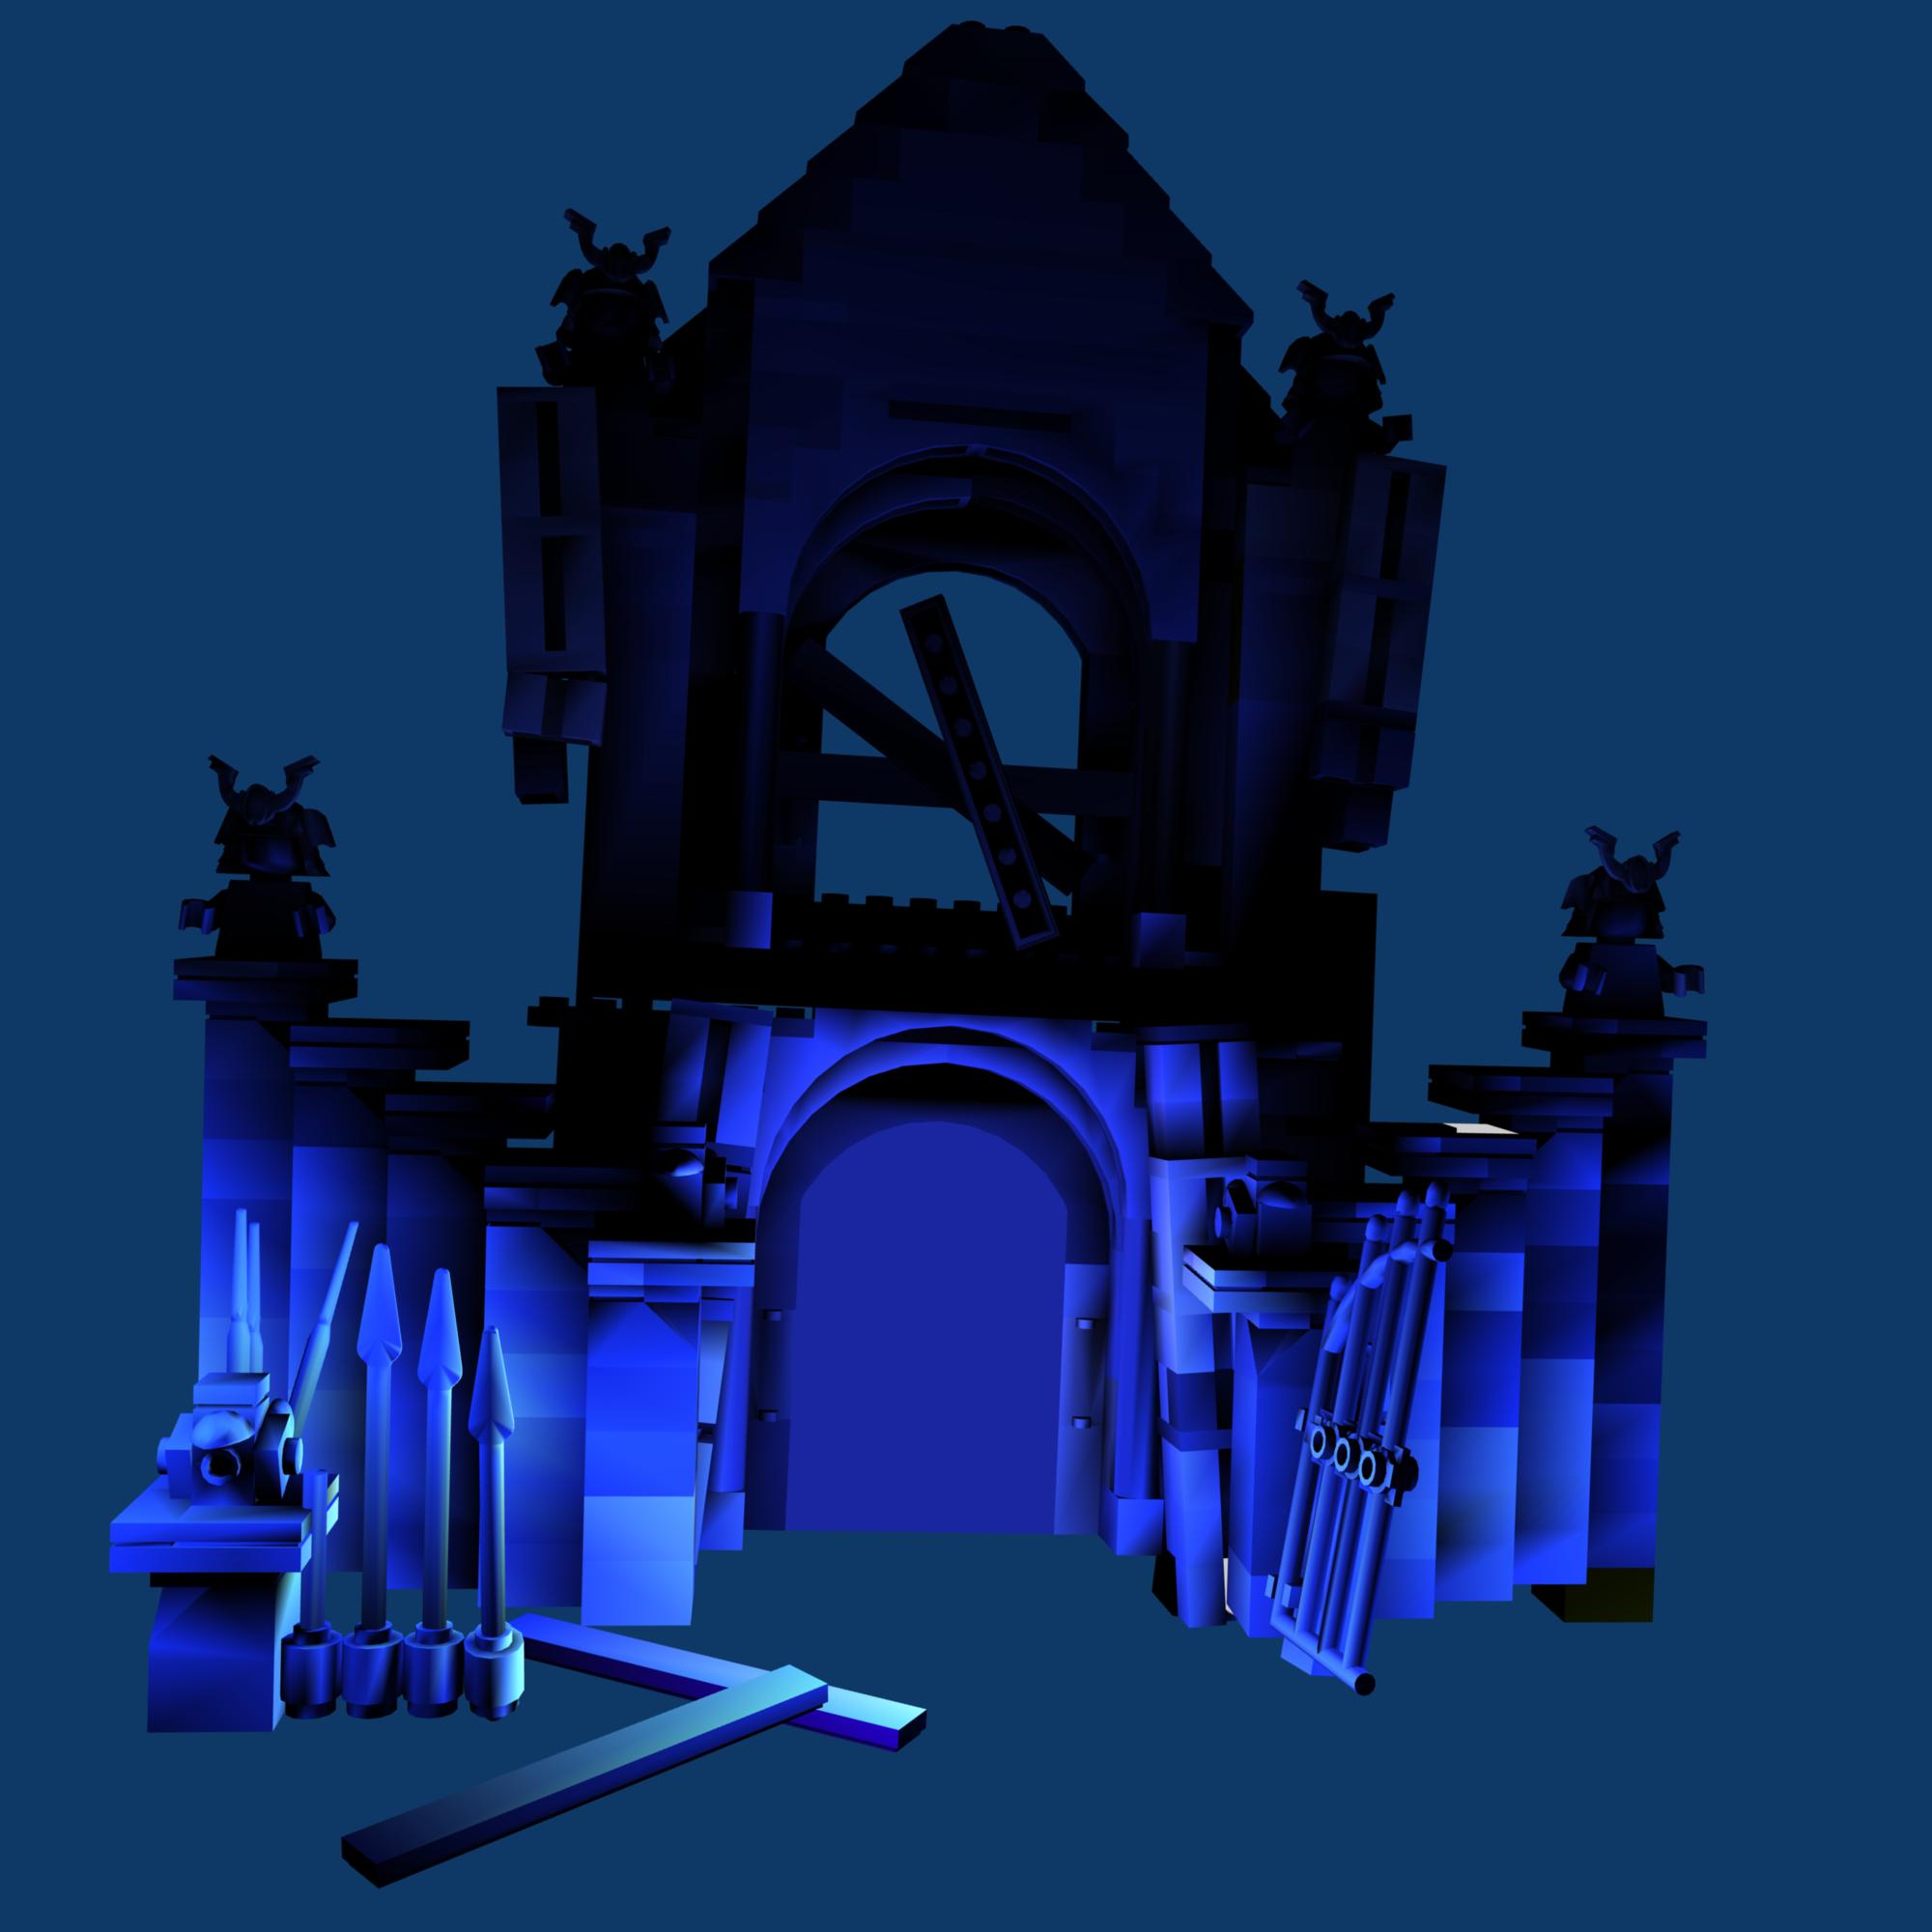 Gate clipart gothic. Graveyard suggest hanslodge cliparts